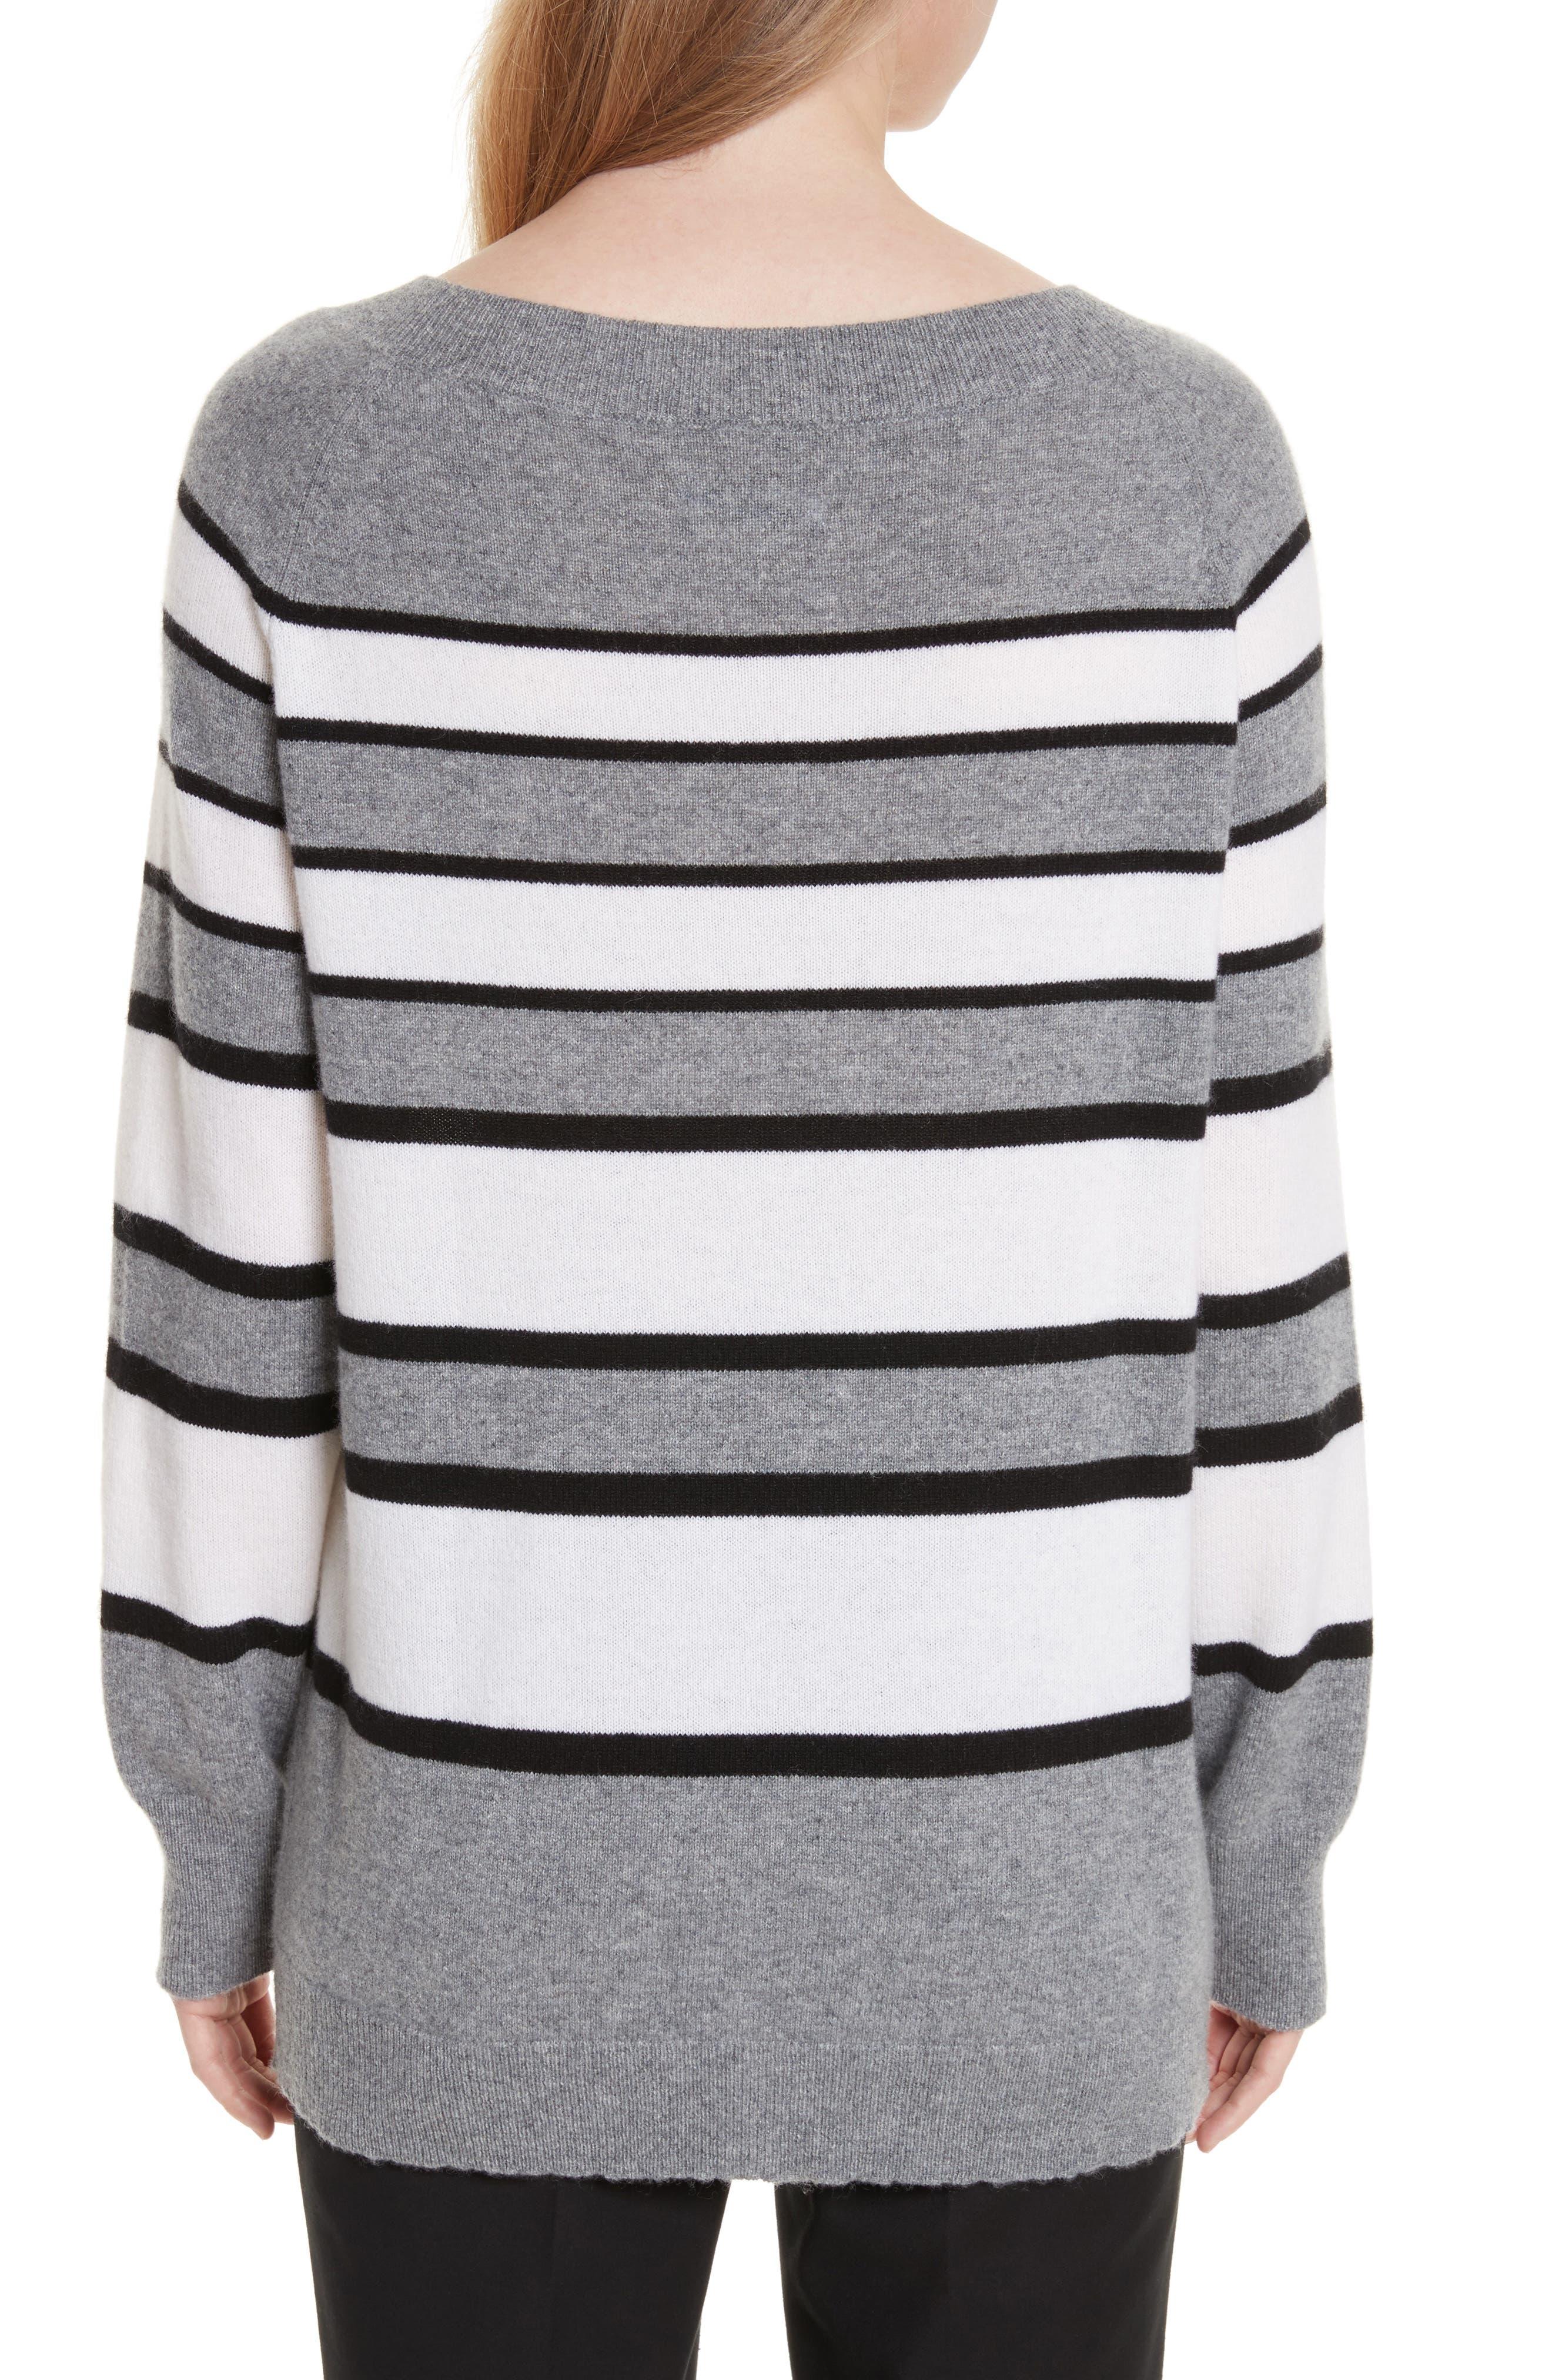 Cody Stripe Cashmere Boat Neck Sweater,                             Alternate thumbnail 2, color,                             Heather Grey Multi